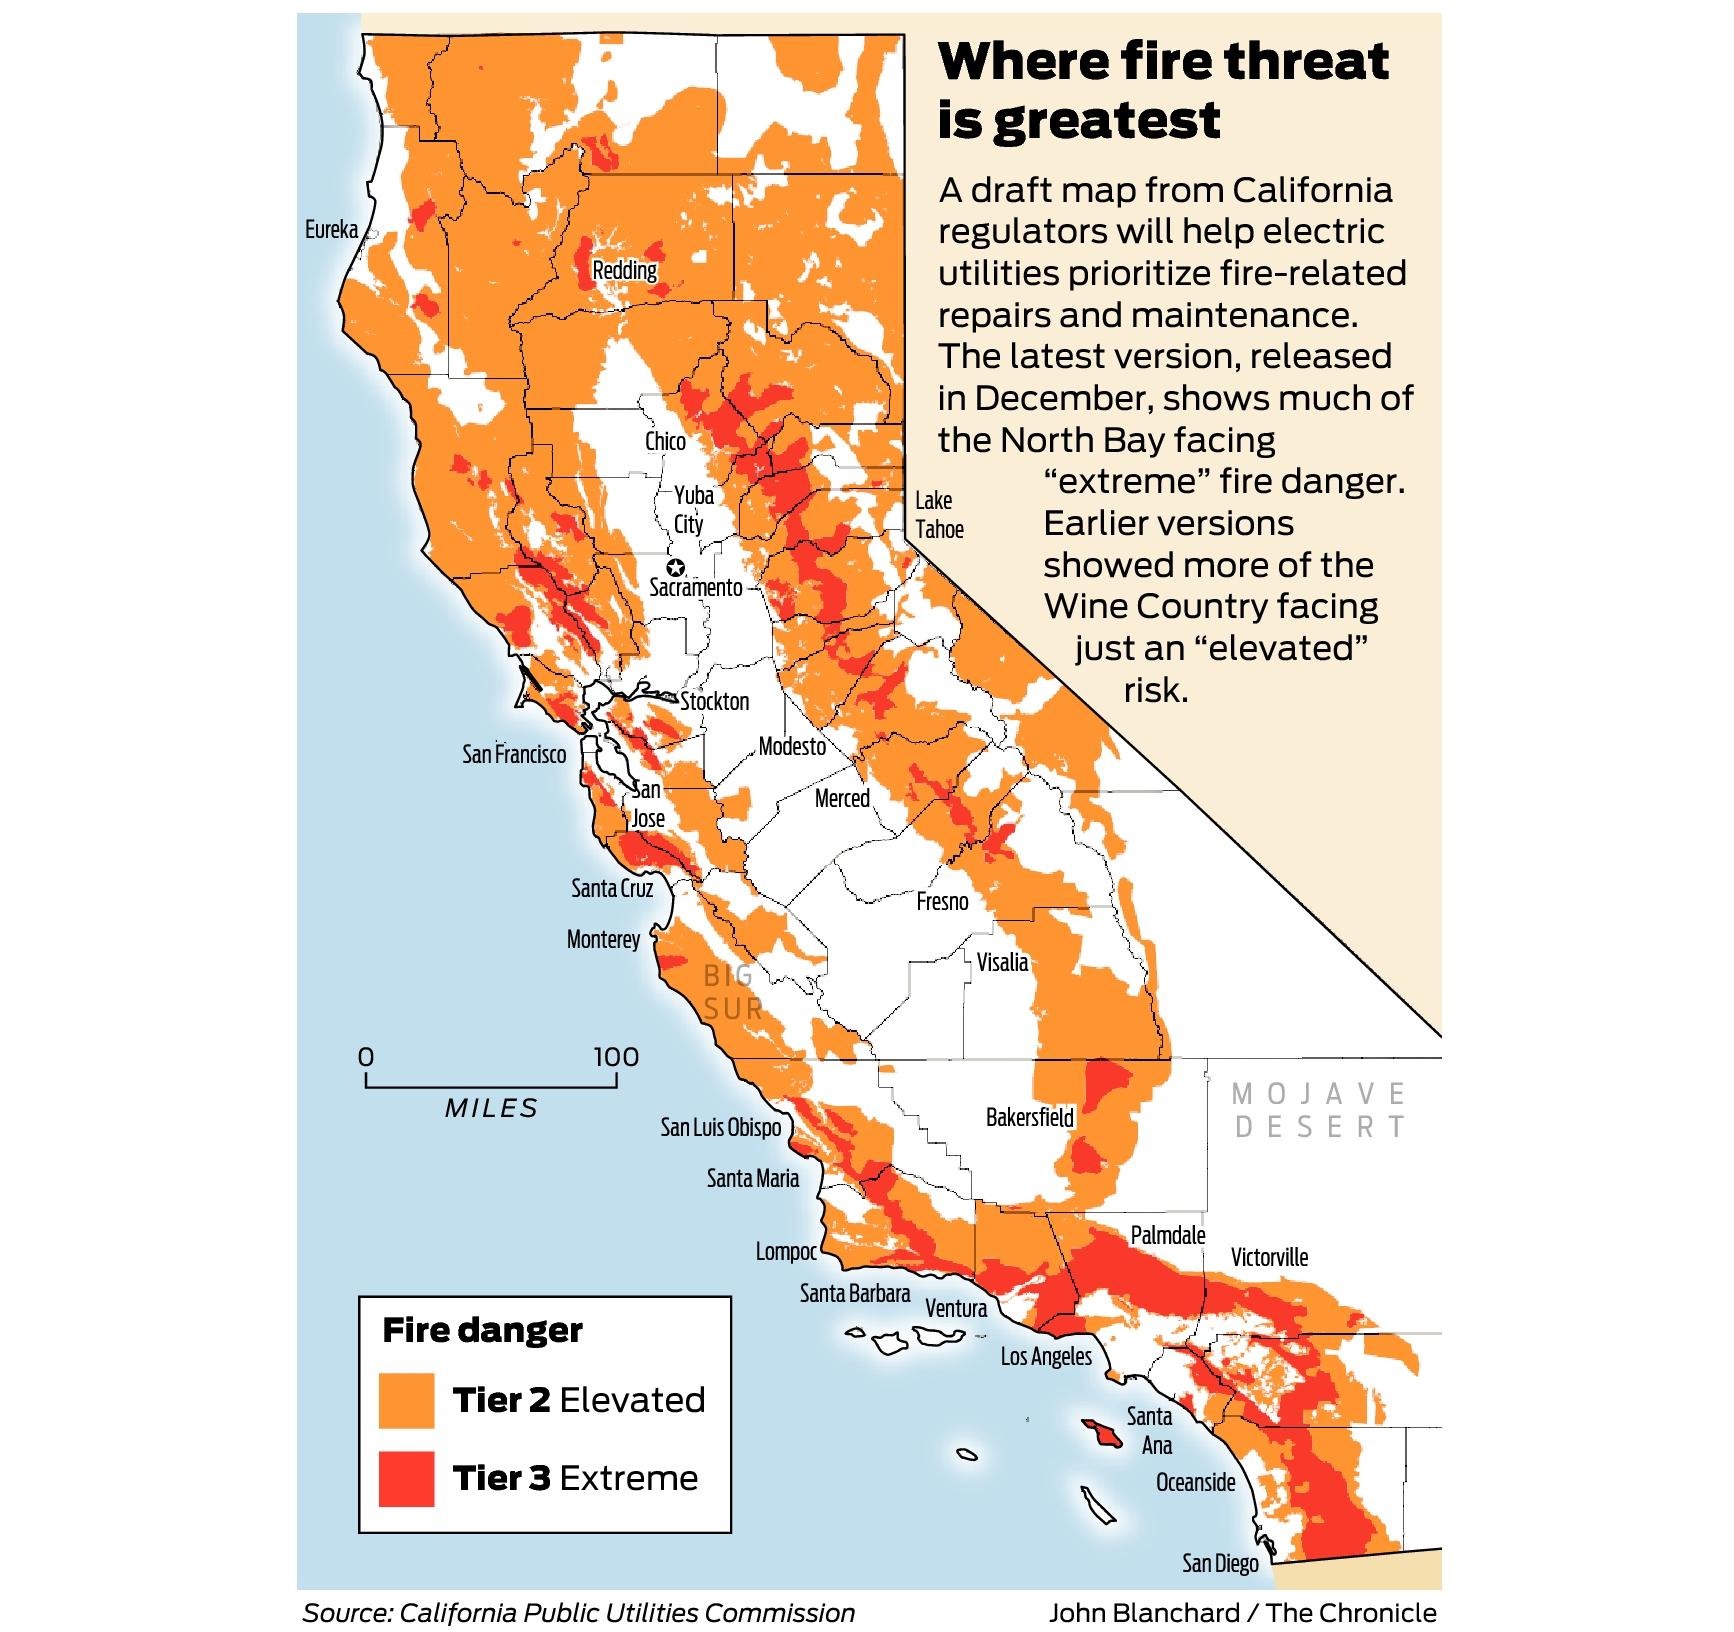 California Fire-Threat Map Not Quite Done But Close, Regulators Say - California Wildfire Risk Map